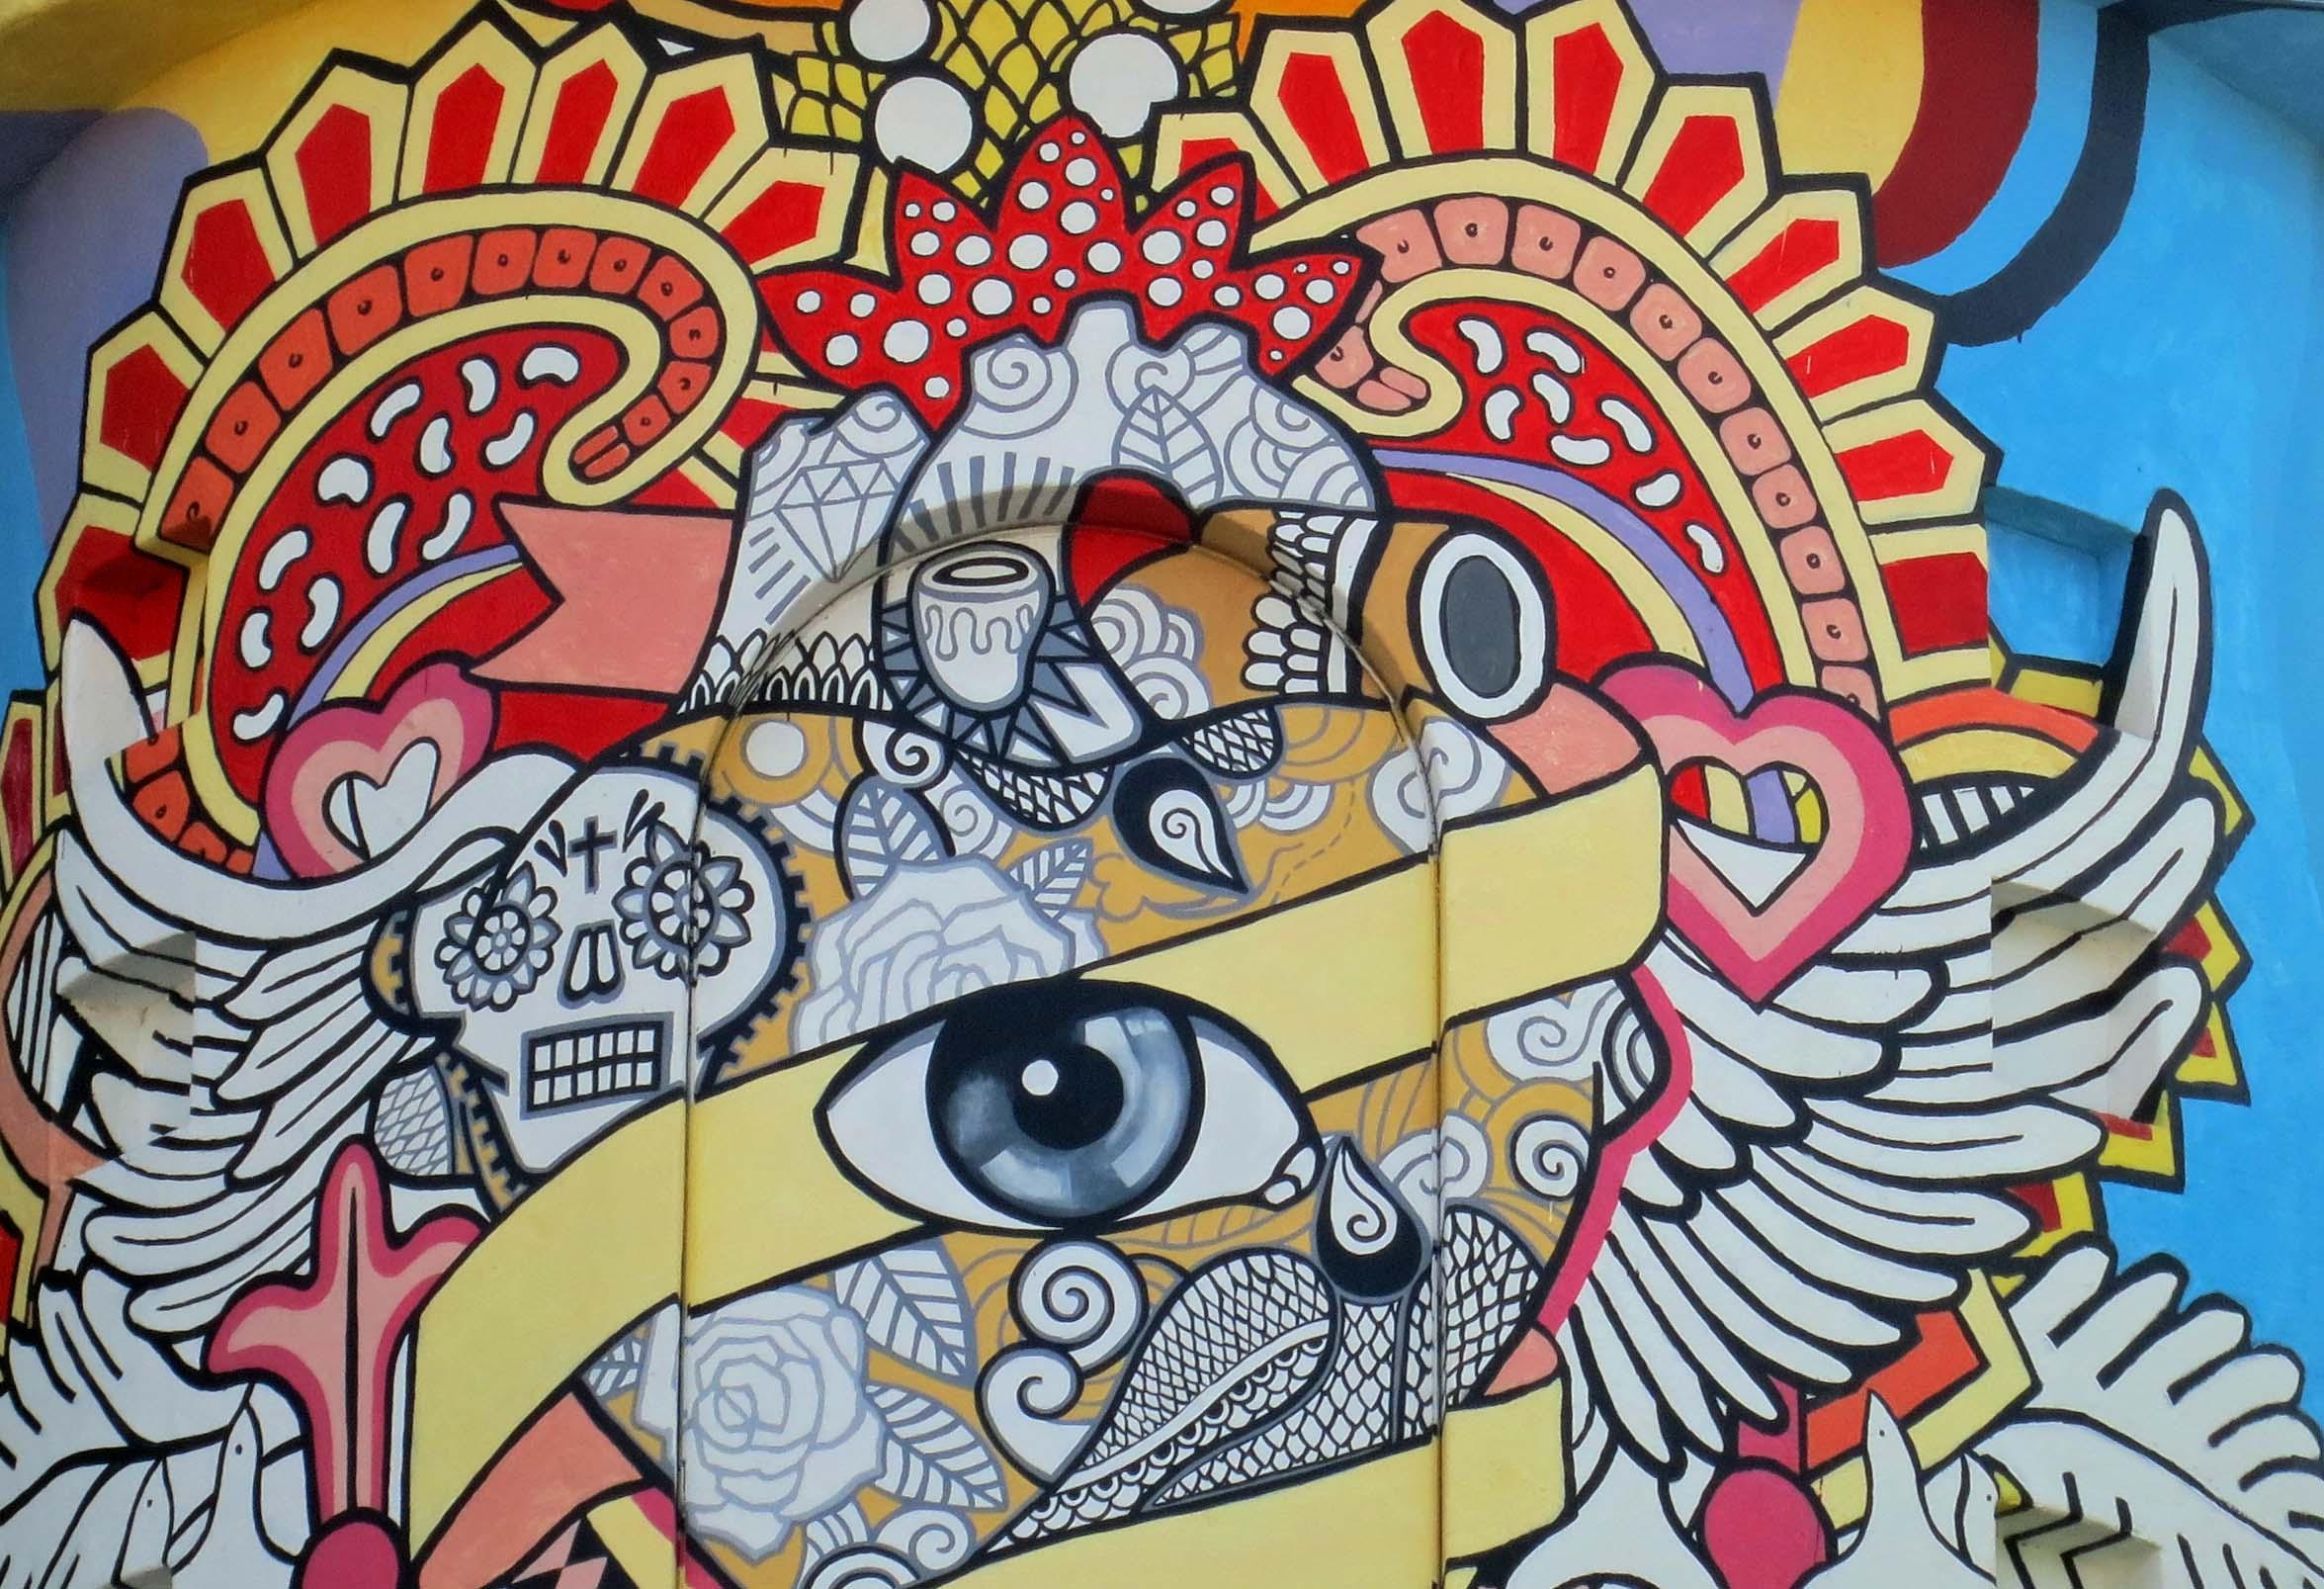 Artist's Cafe mural in Puerto Vallarta. Photo by Curtis Mekemson.